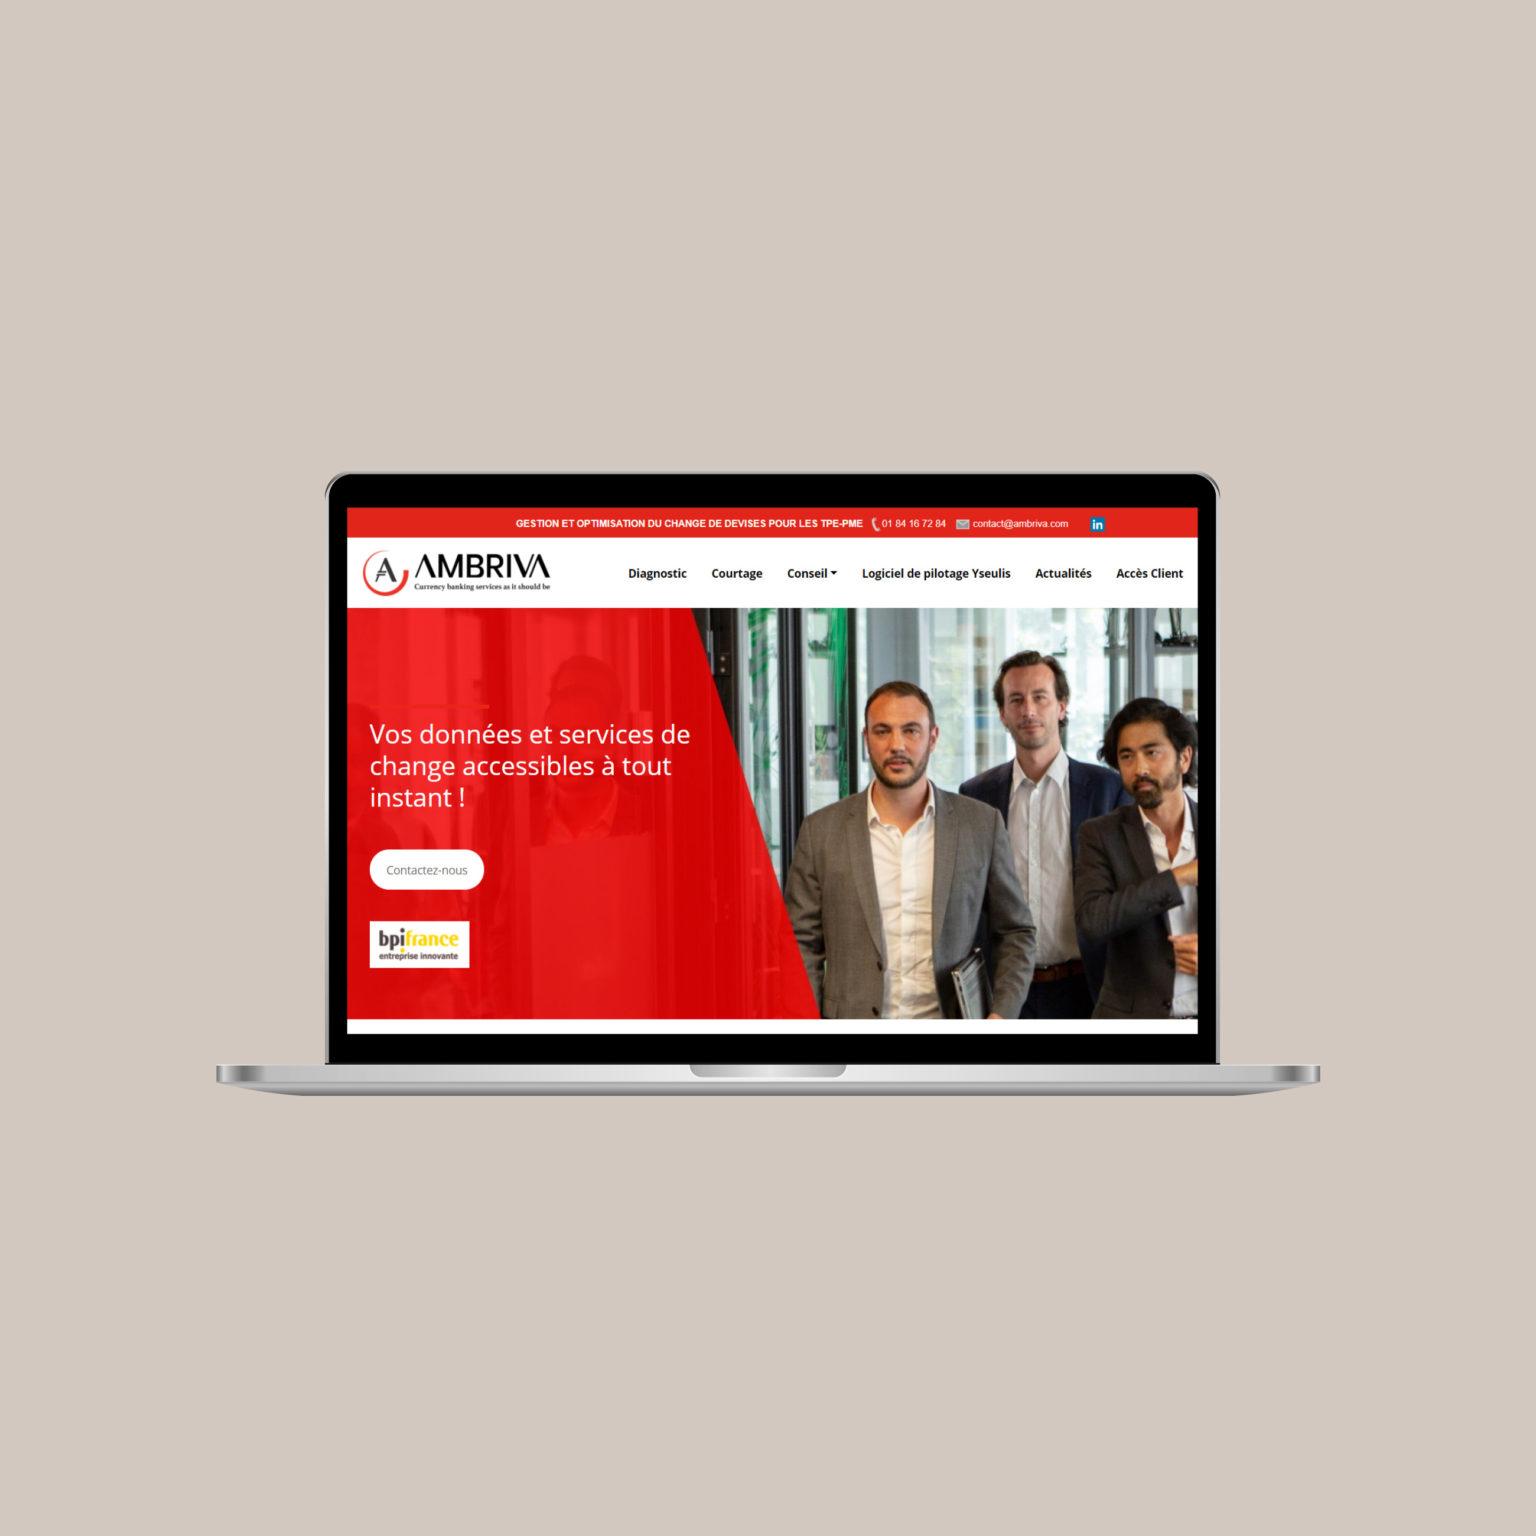 Miko Digital Agence Web à Liège - Ambriva